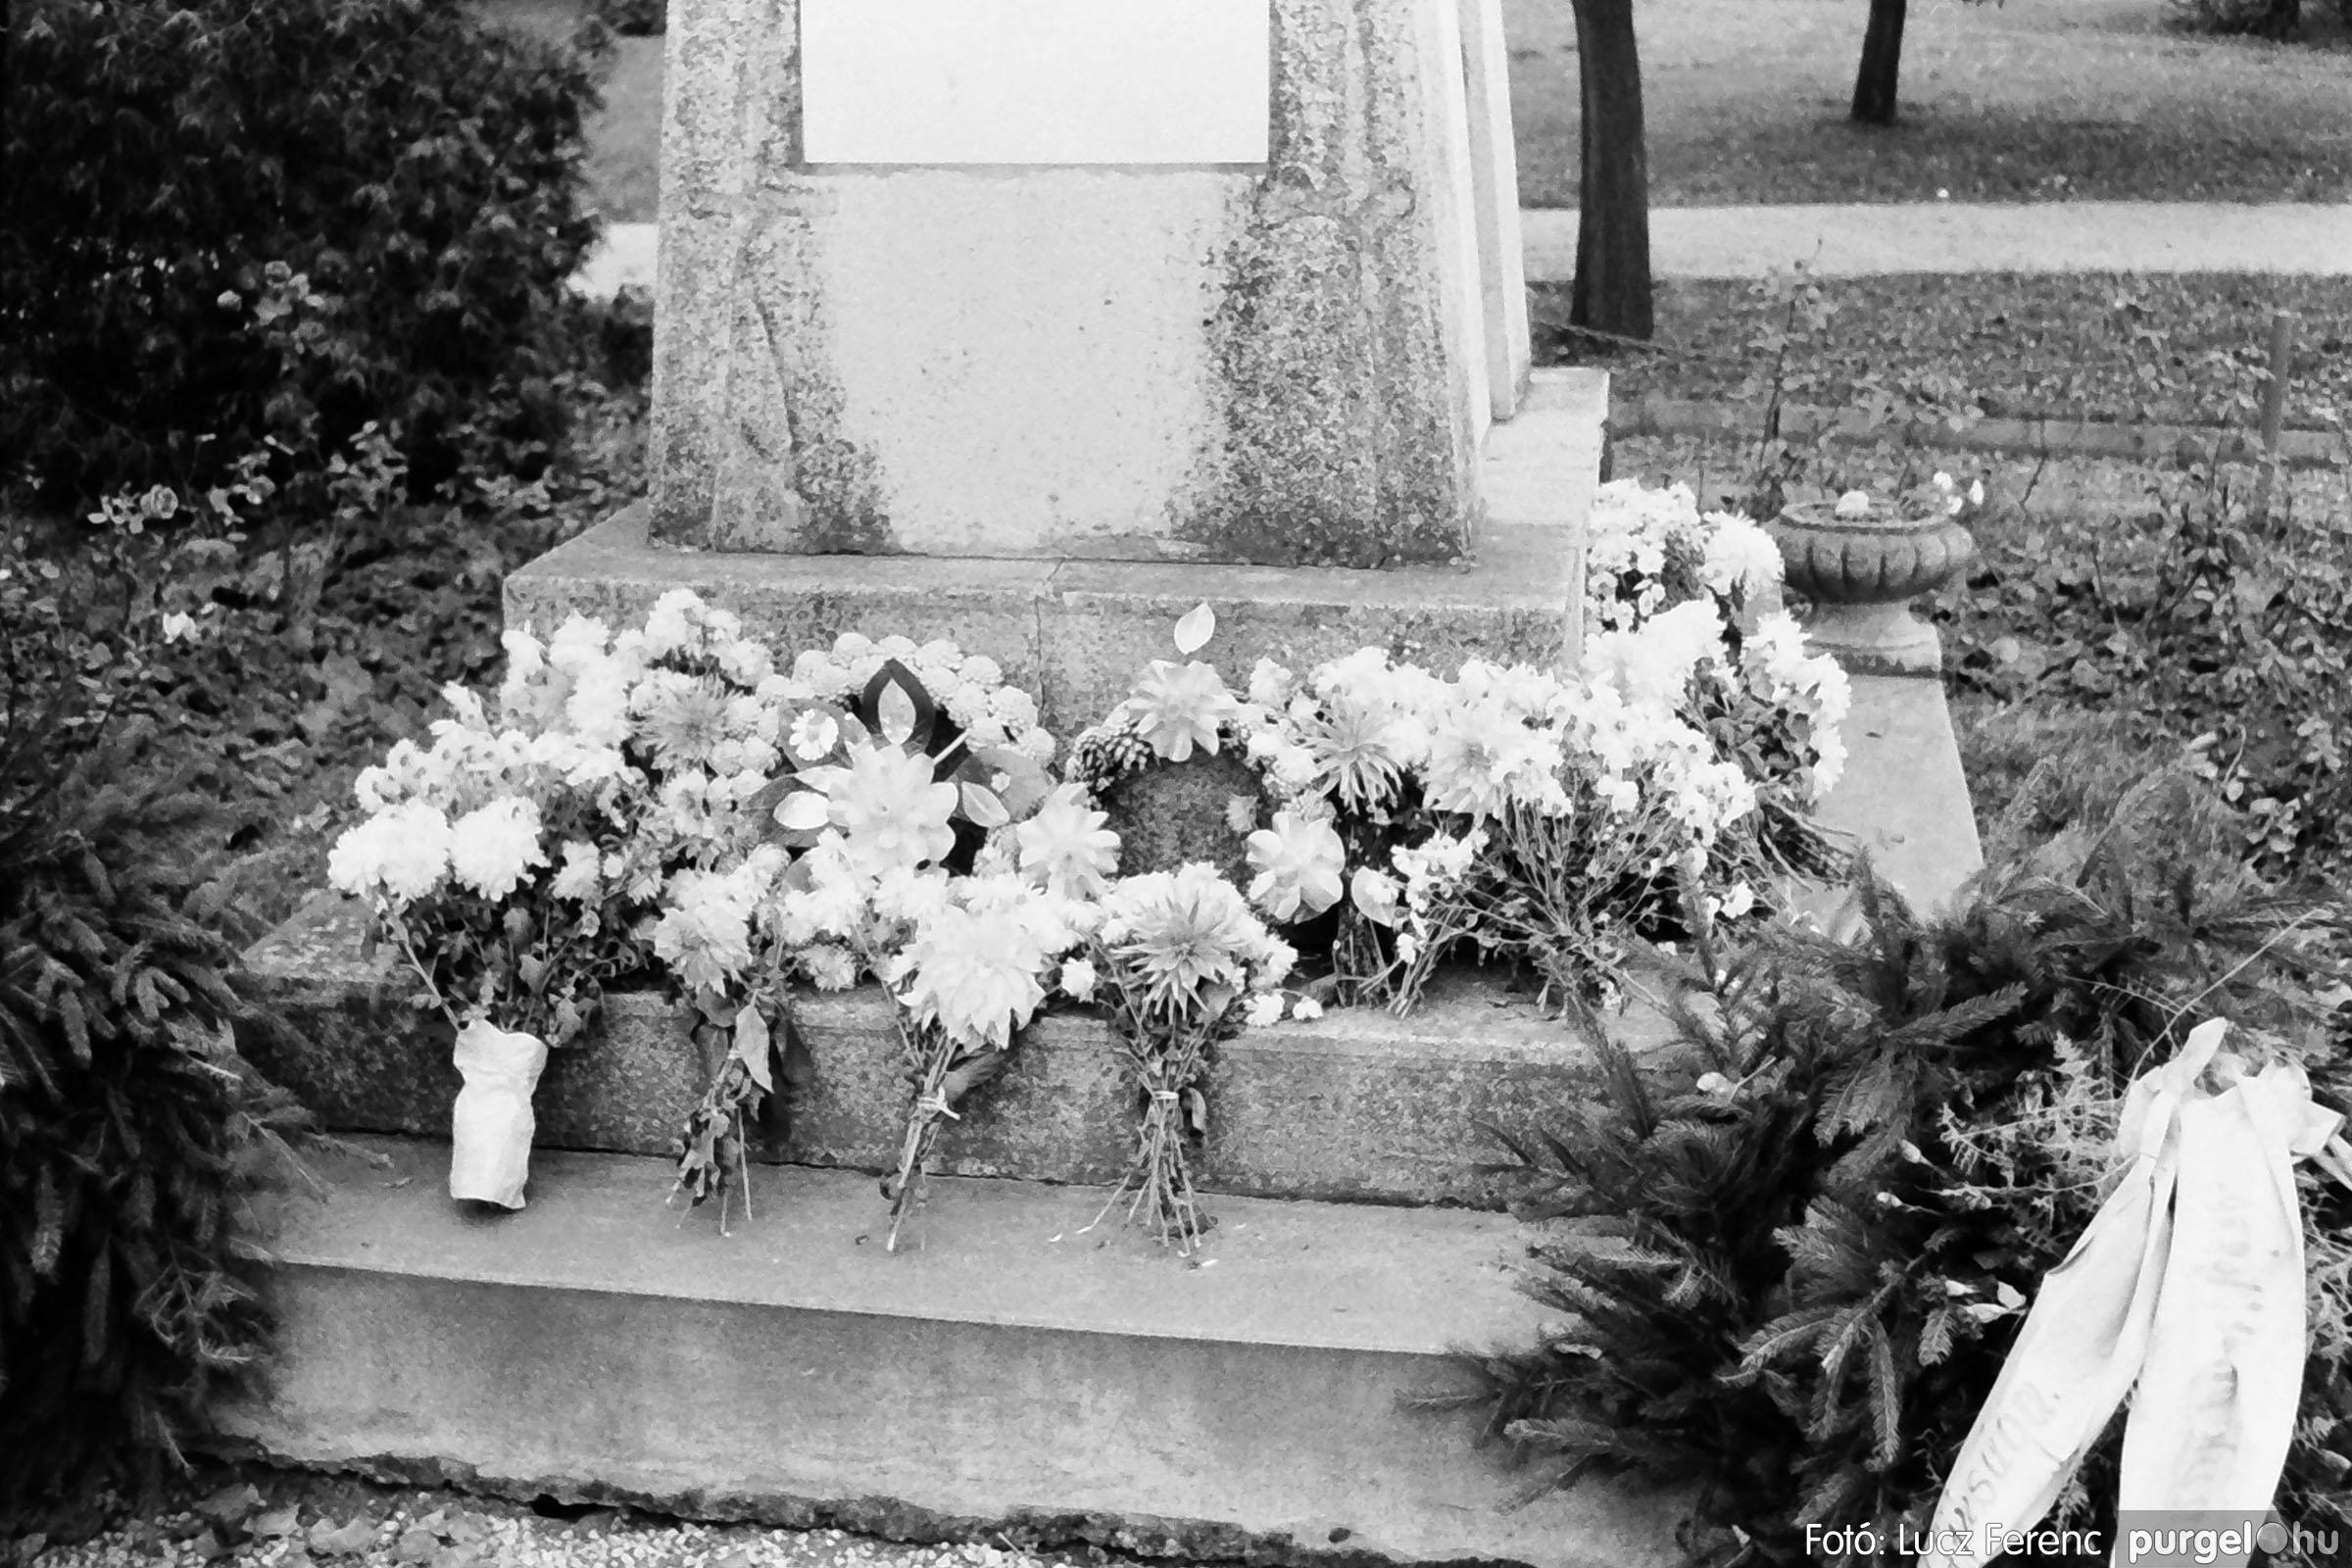 025 1975.10. Szovjet katonai emlékmű 005 - Fotó: Lucz Ferenc IMG00234q.jpg